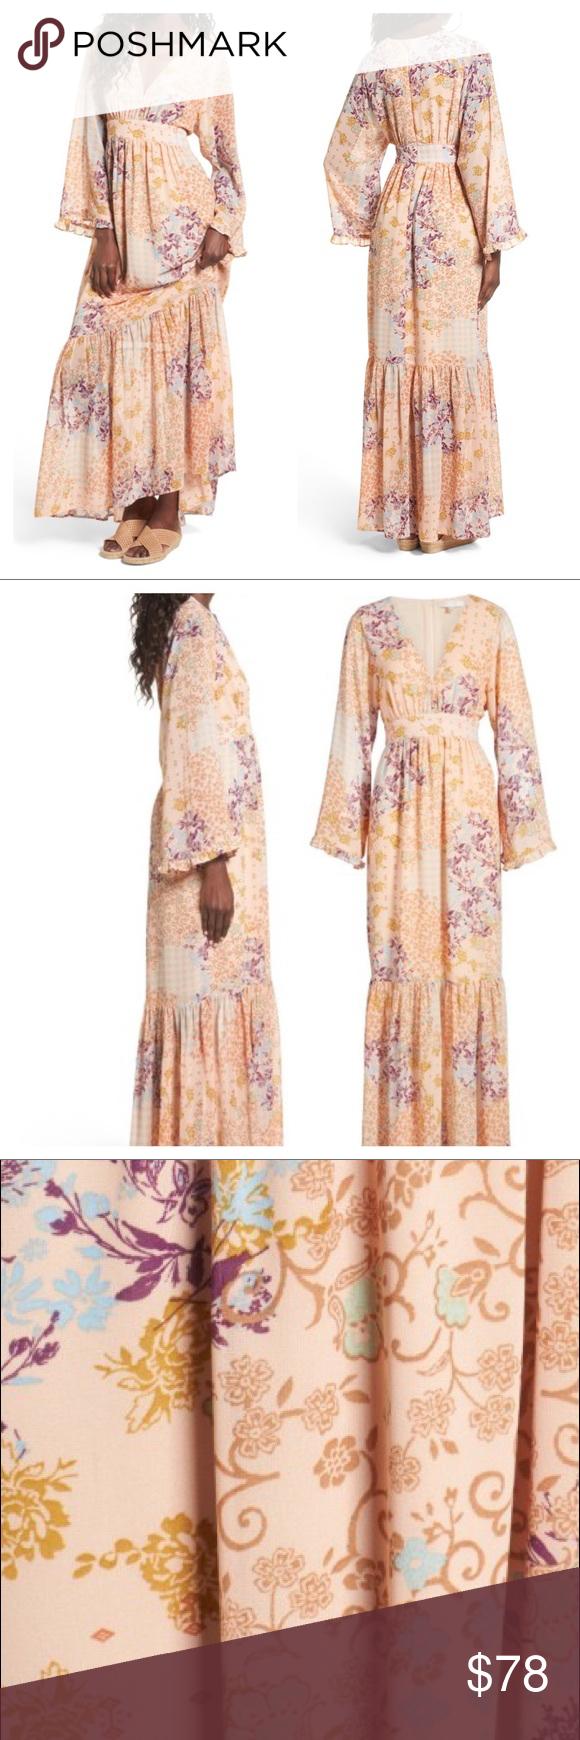 New wayf viola bell sleeve maxi dress nwt in my posh picks